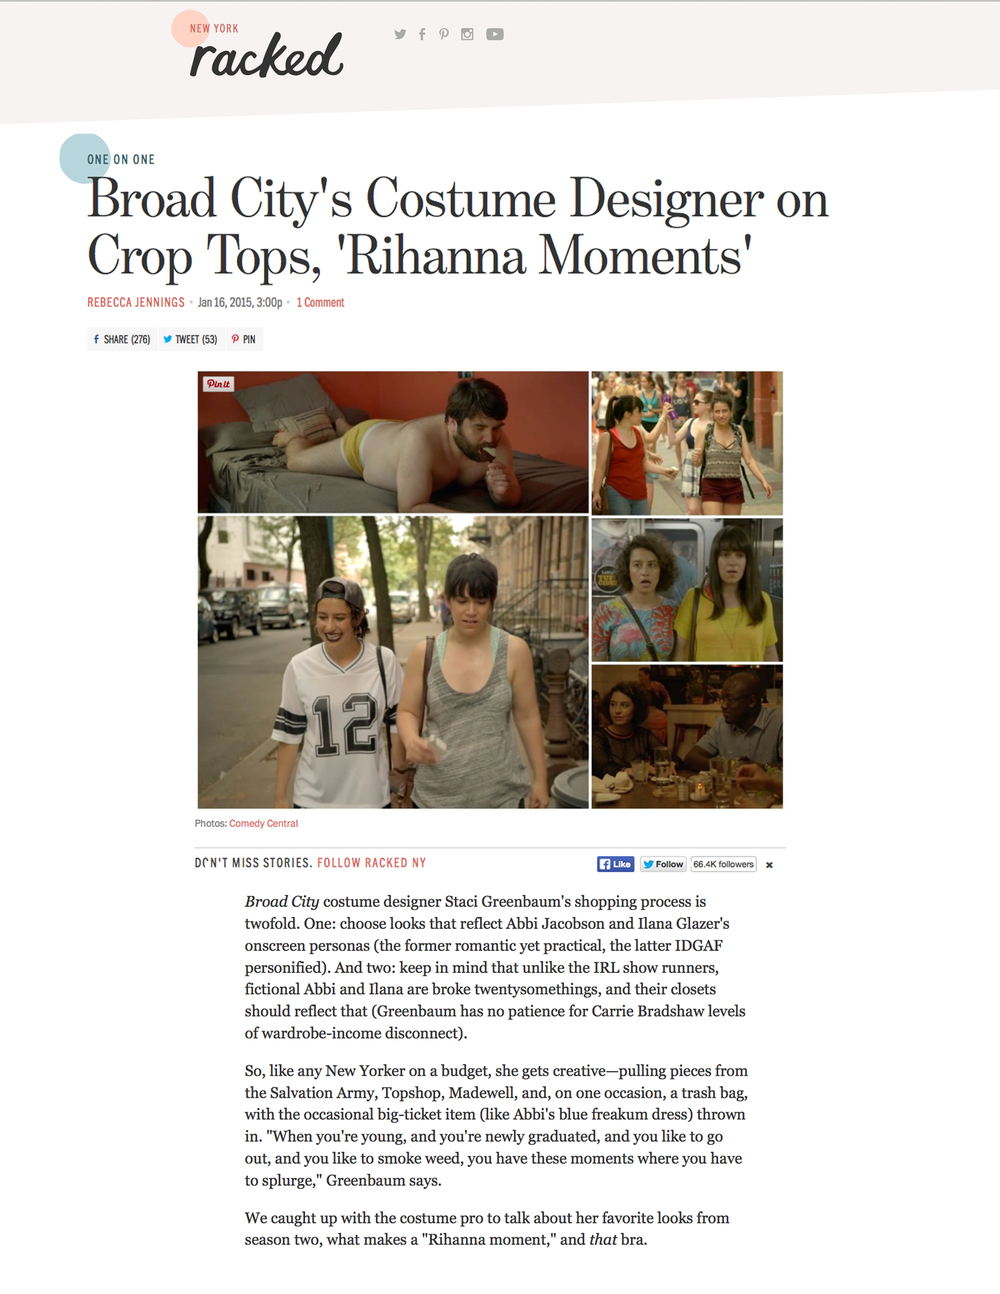 NY RACKED    BROAD CITY'S COSTUME DESIGNER ON CROP TOPS, 'RIHANNA MOMENTS'    JANUARY 2015